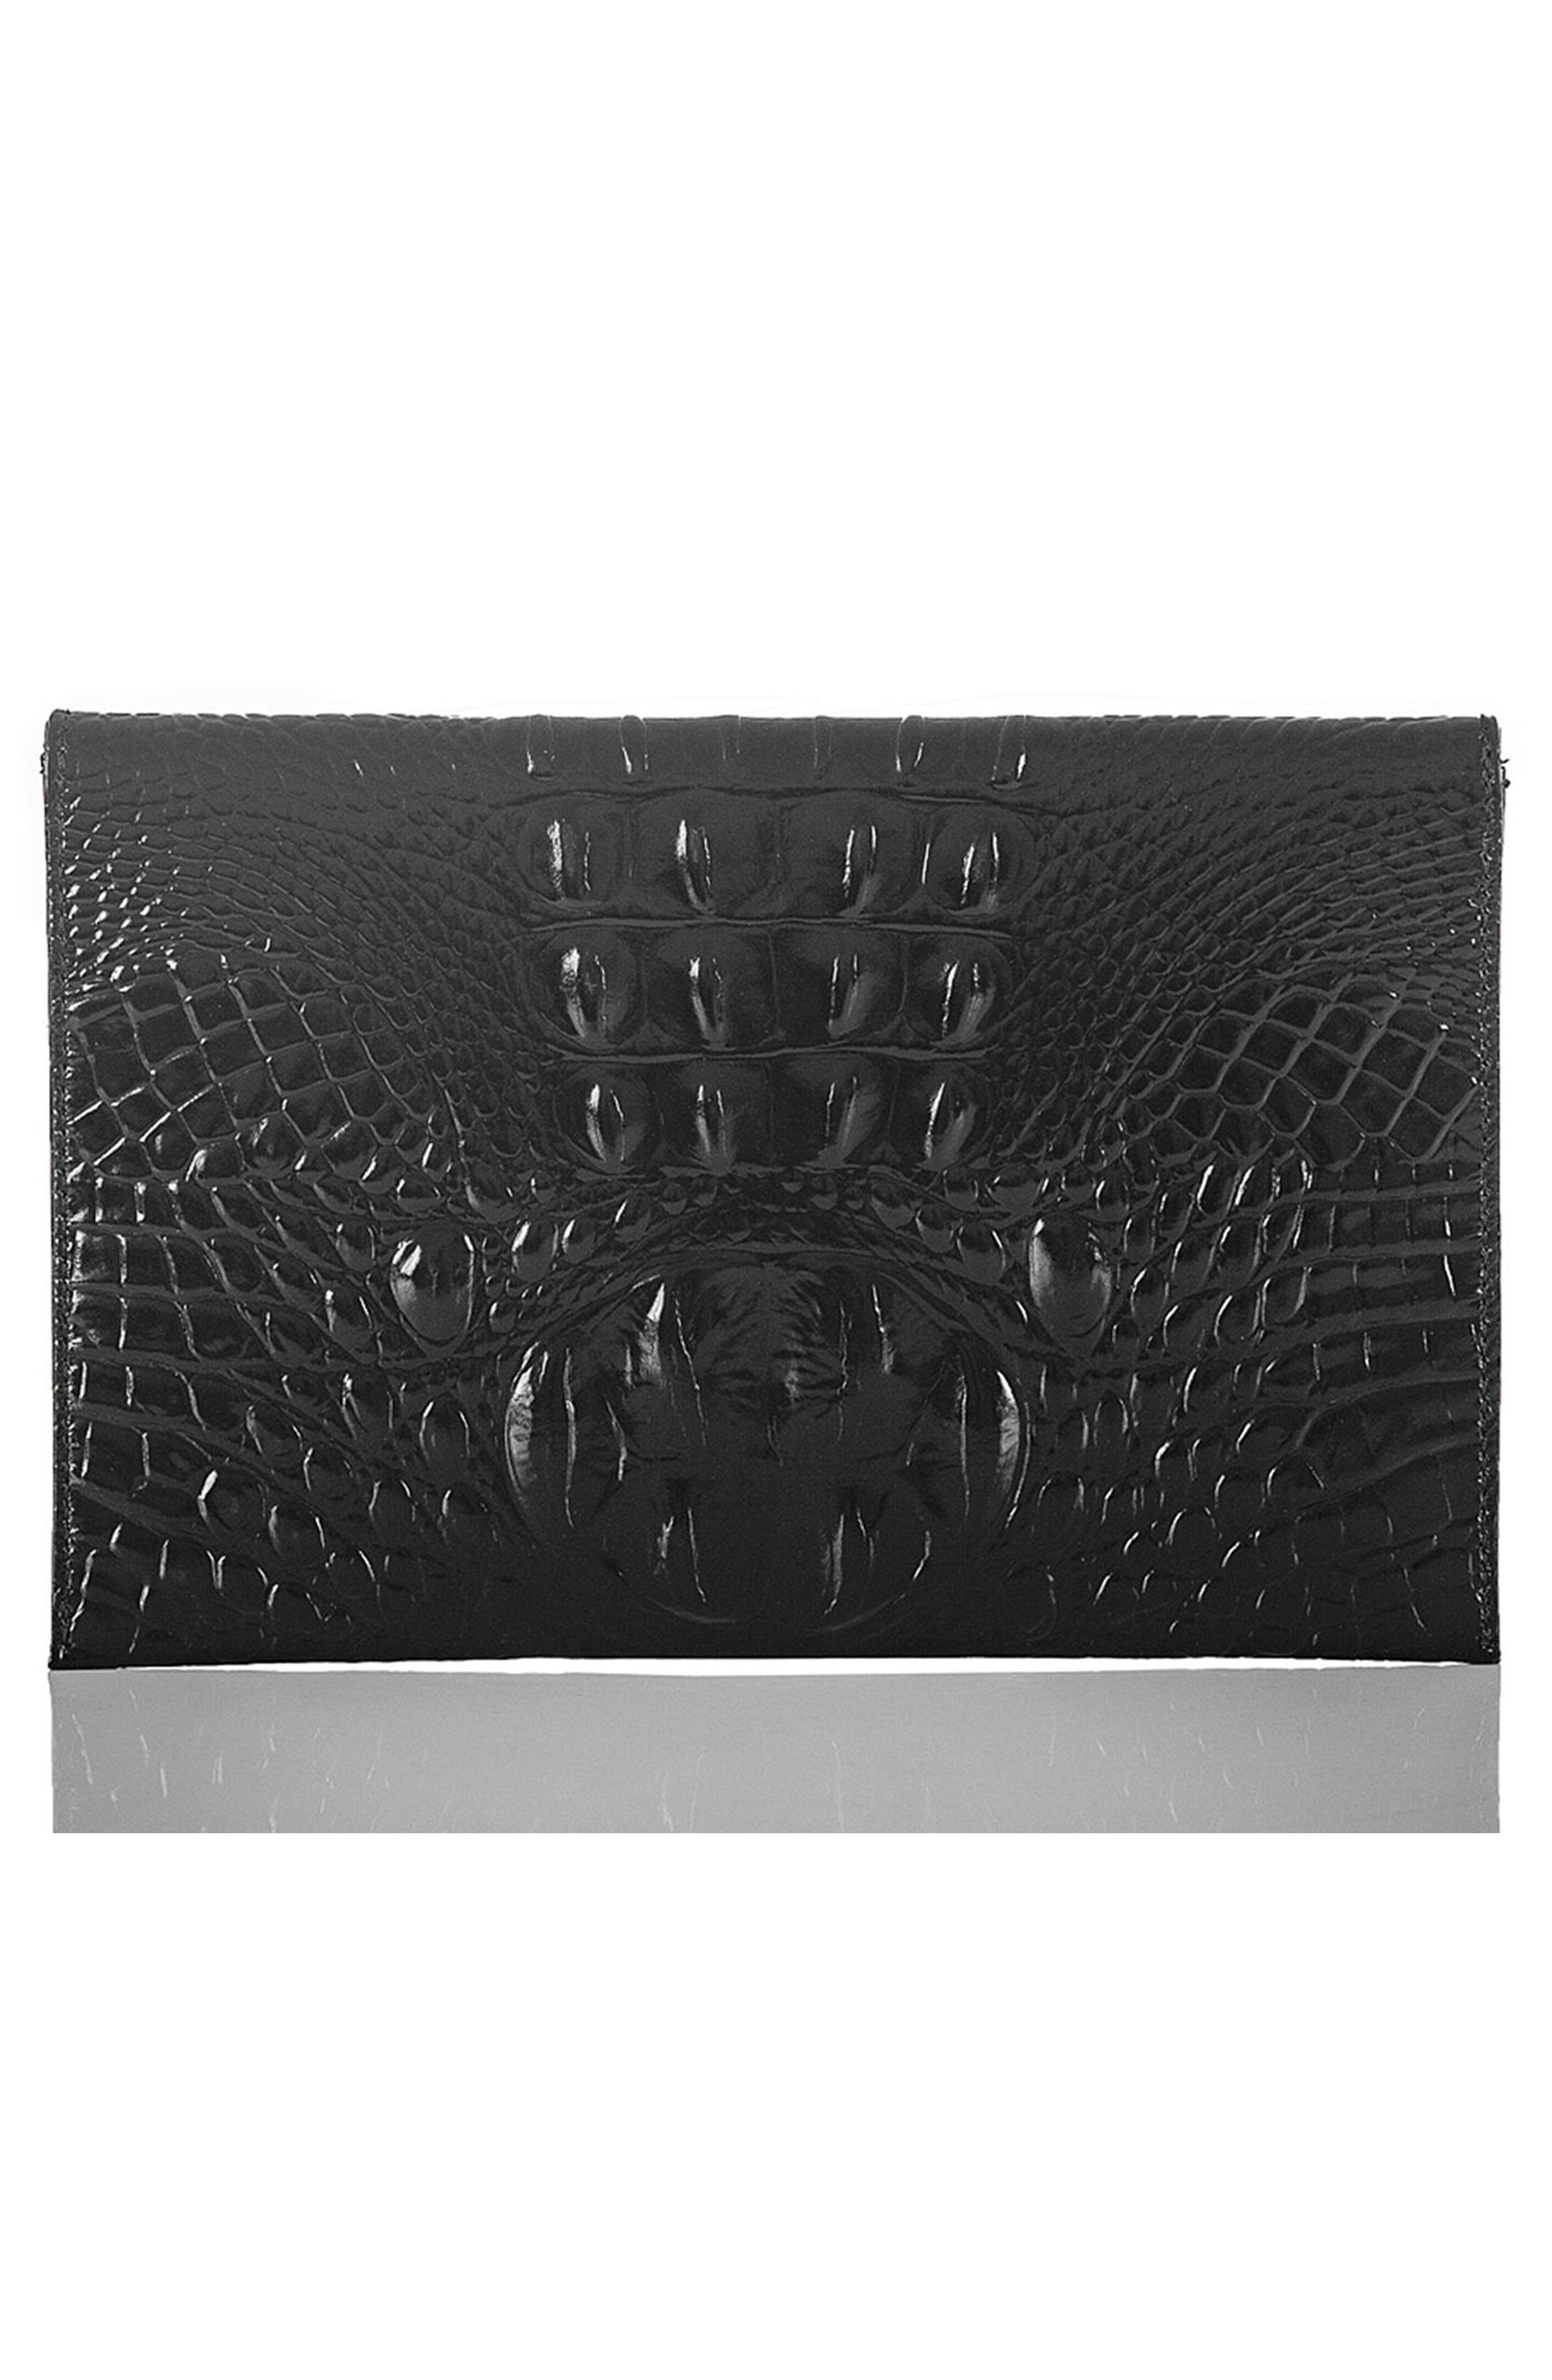 Melbourne Croc Embossed Leather Envelope Clutch,                             Alternate thumbnail 3, color,                             BLACK